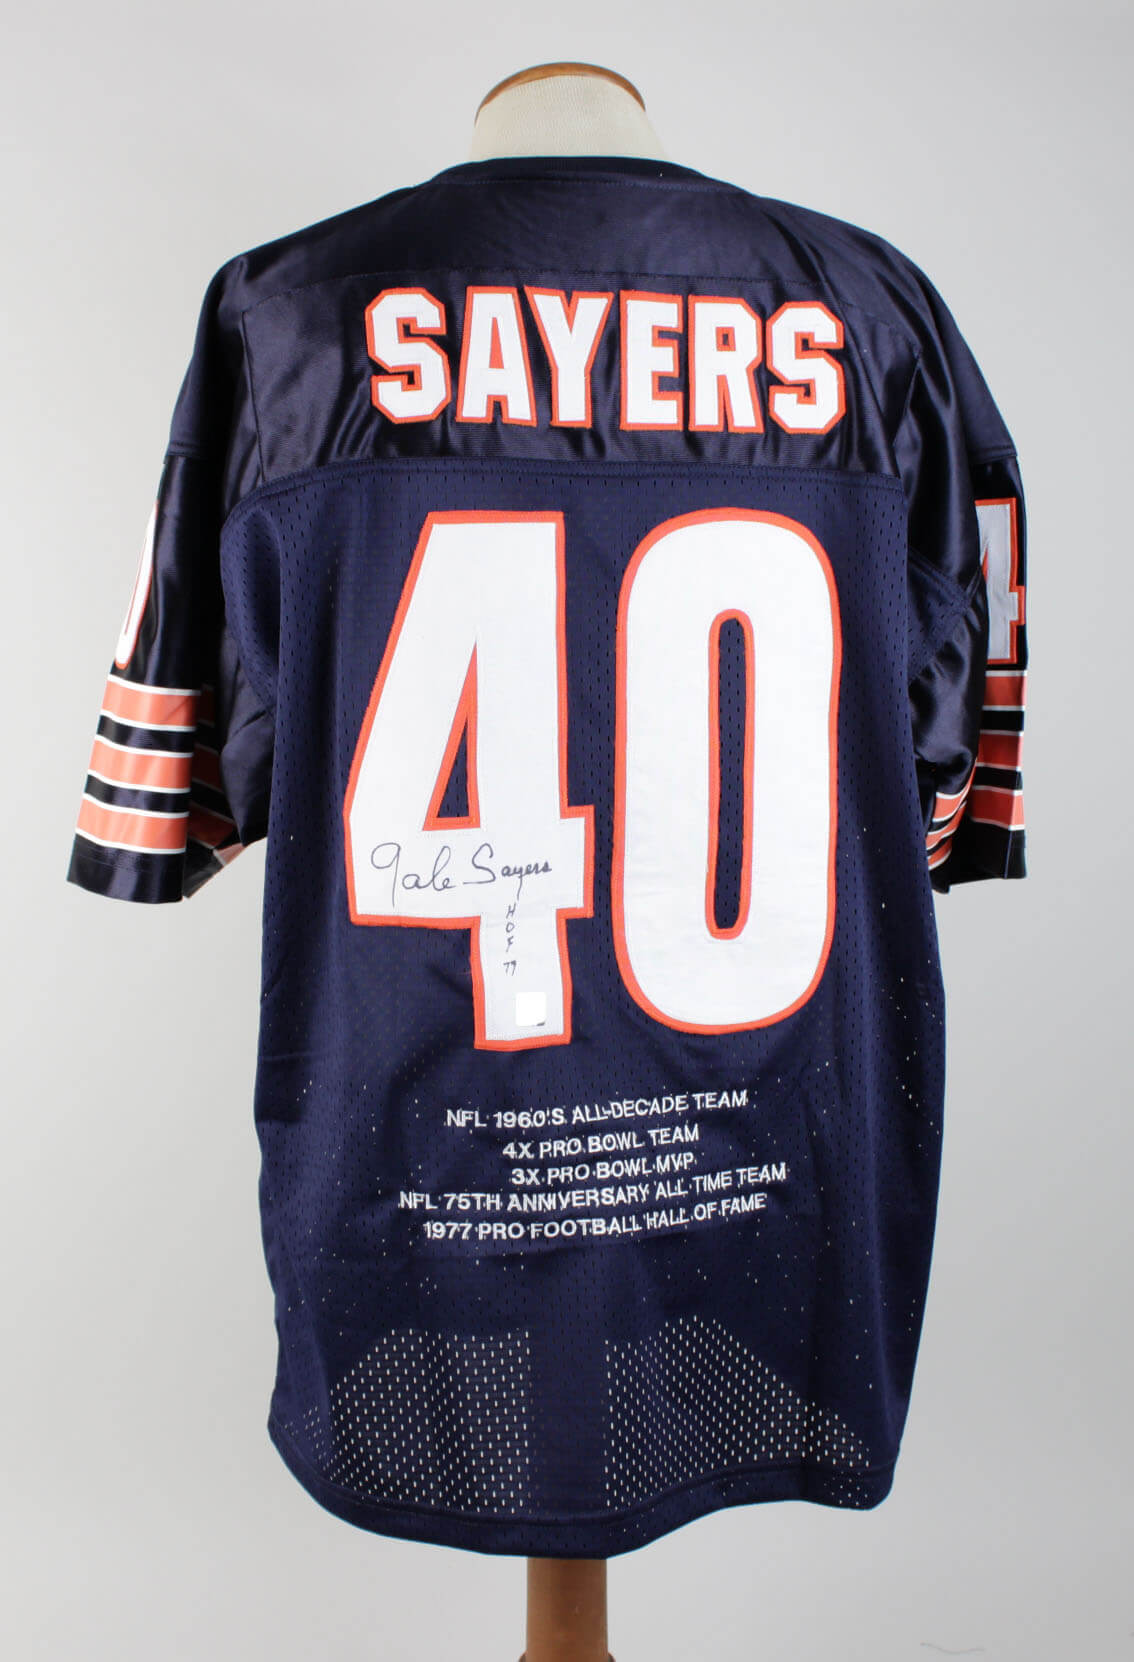 6d0beb129 Gale Sayers Signed Jersey Bears – COA | Memorabilia Expert